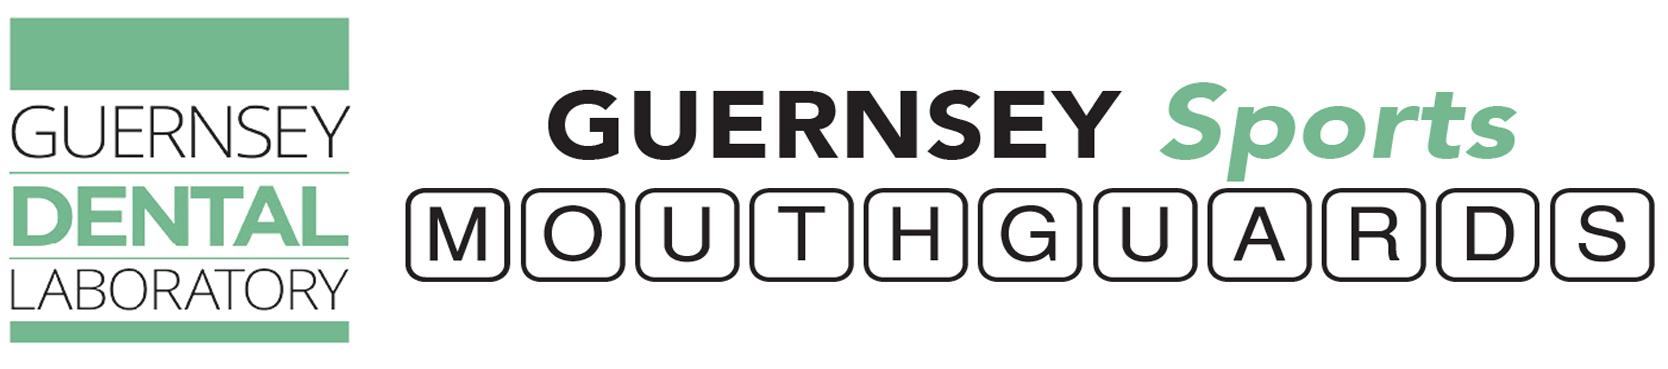 Guernsey Sports Mouthguards Logo